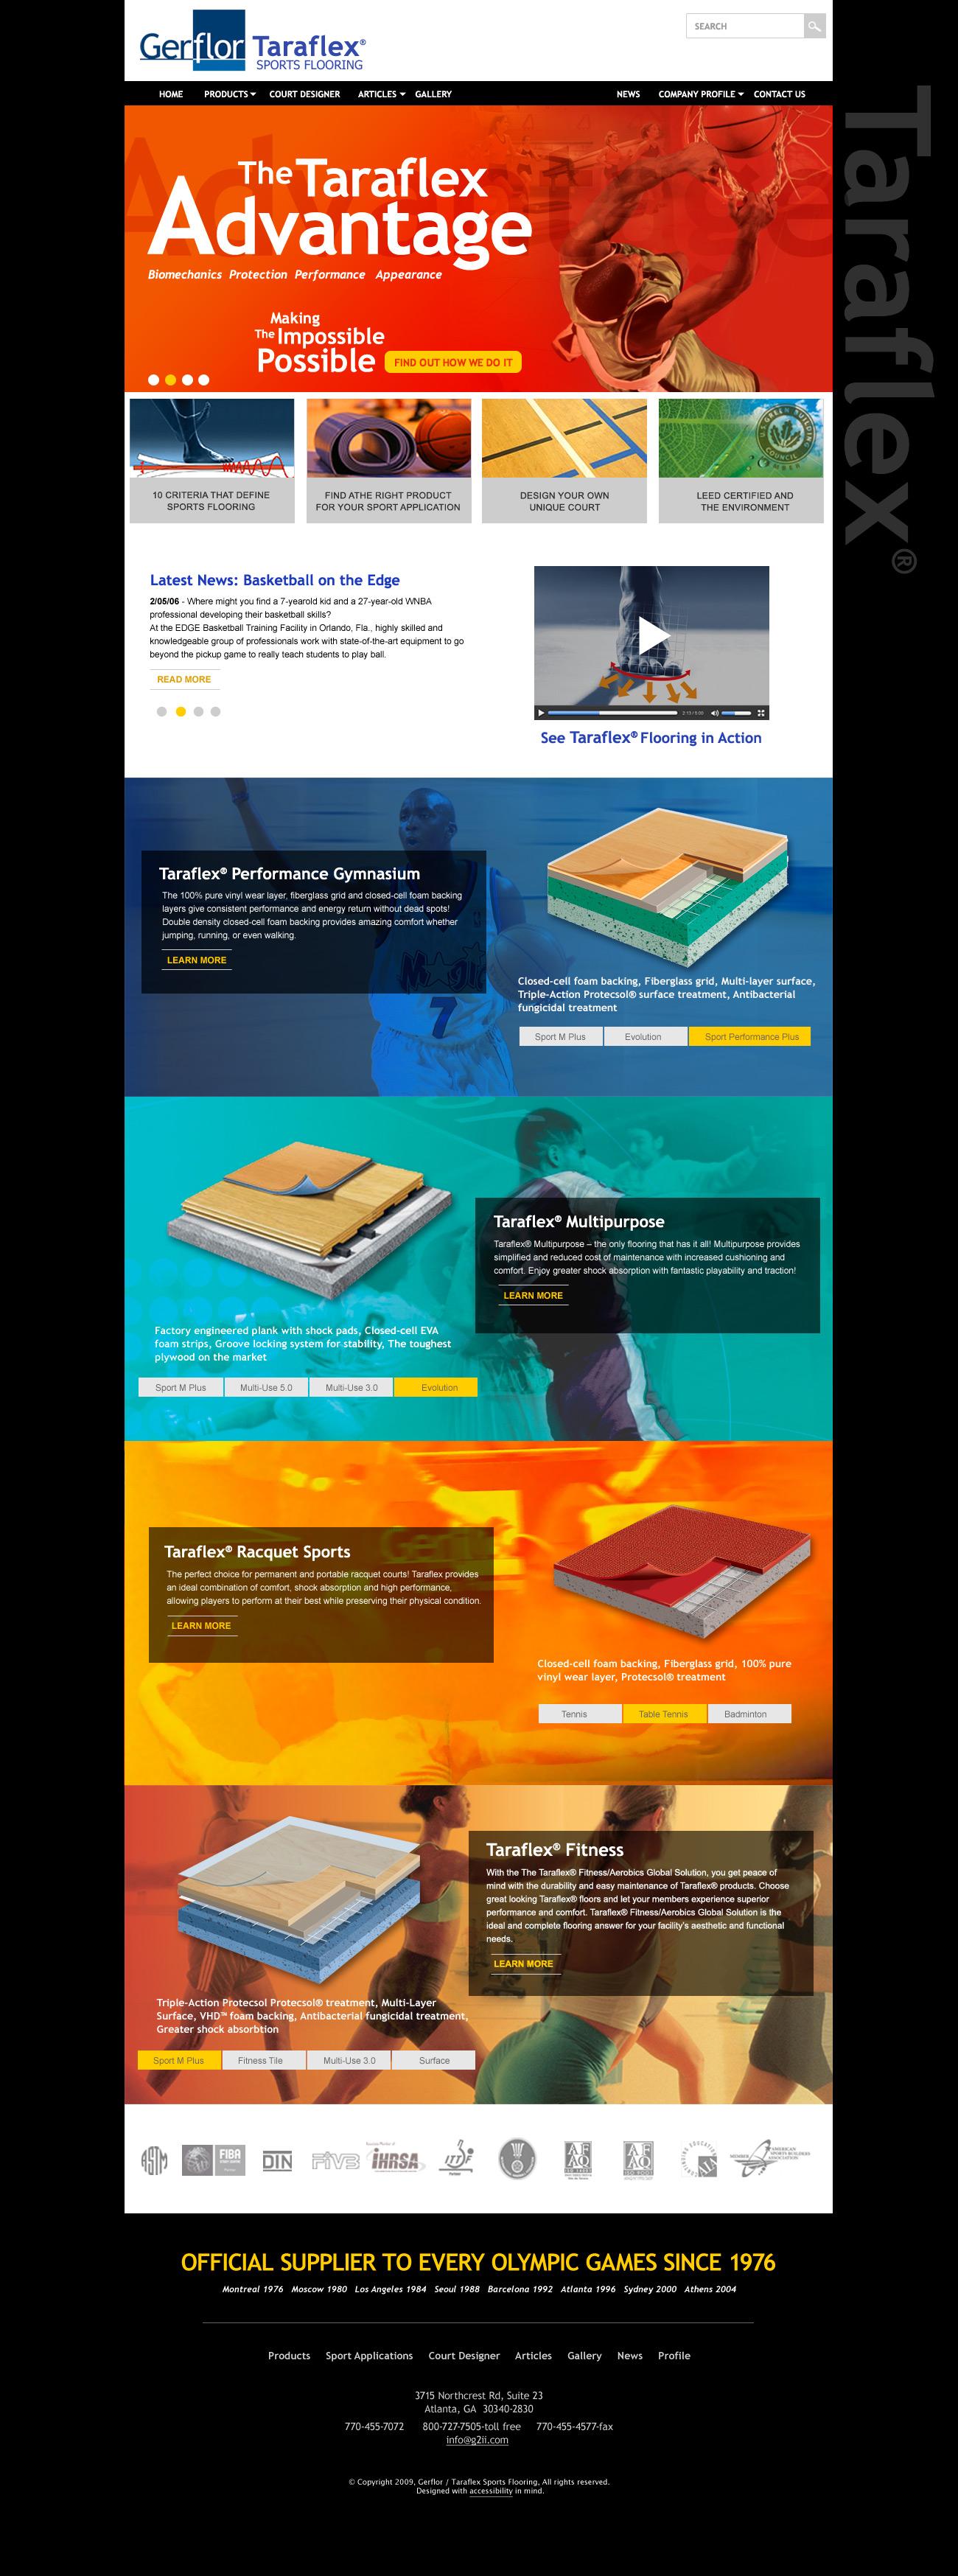 gerlor_taraflex_comp_homepage.jpg